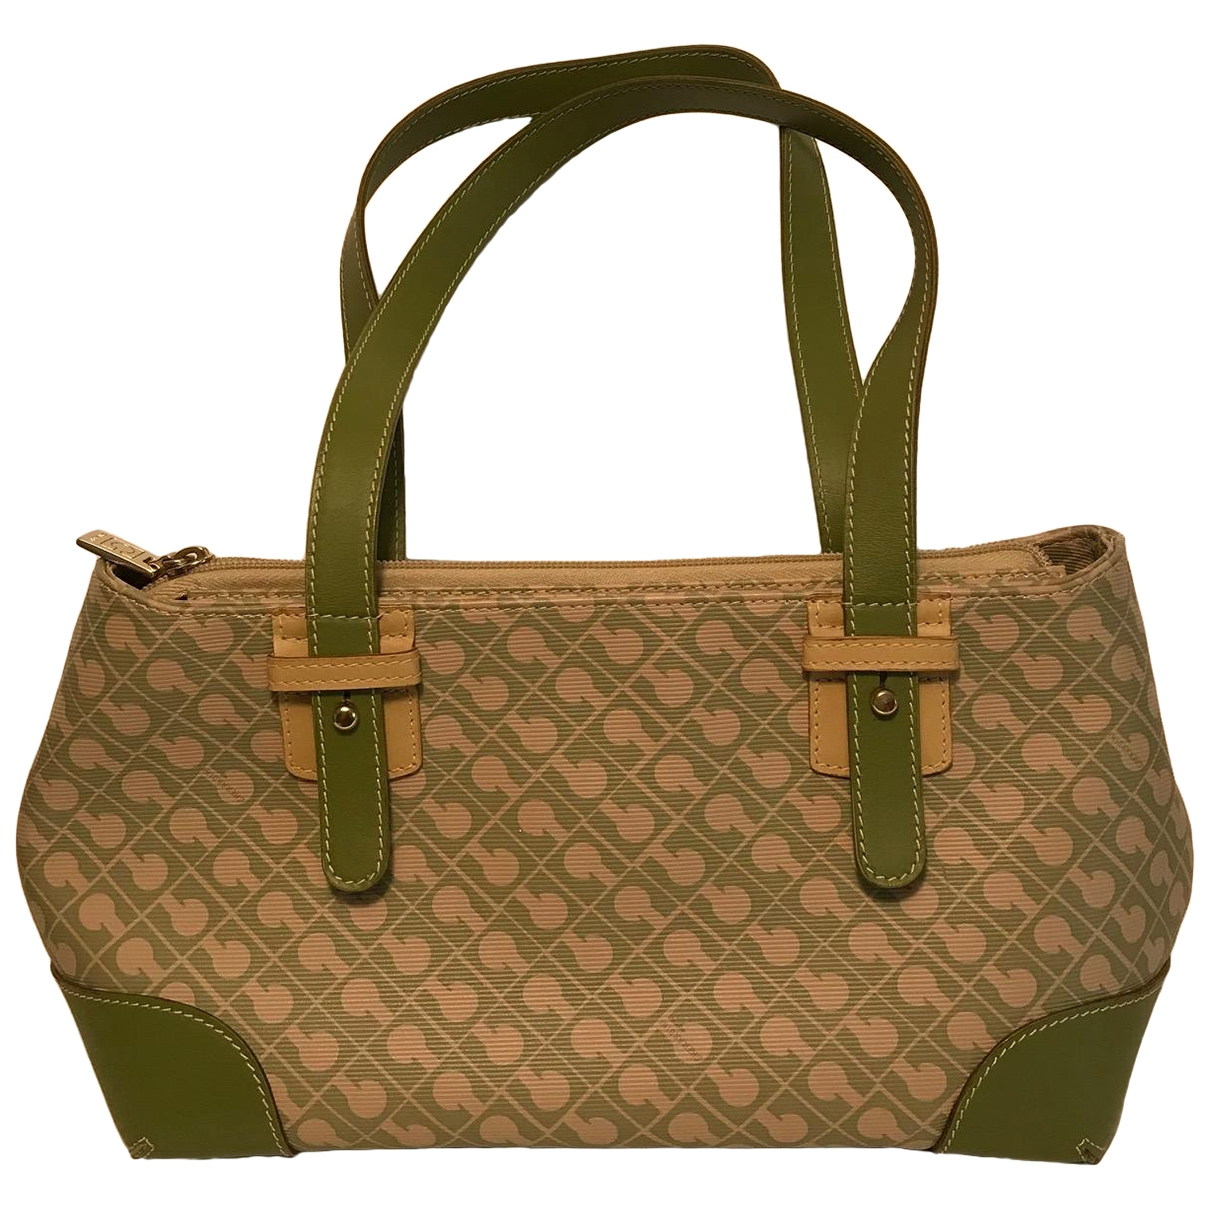 Gherardini \N Handtasche in  Gruen Synthetik